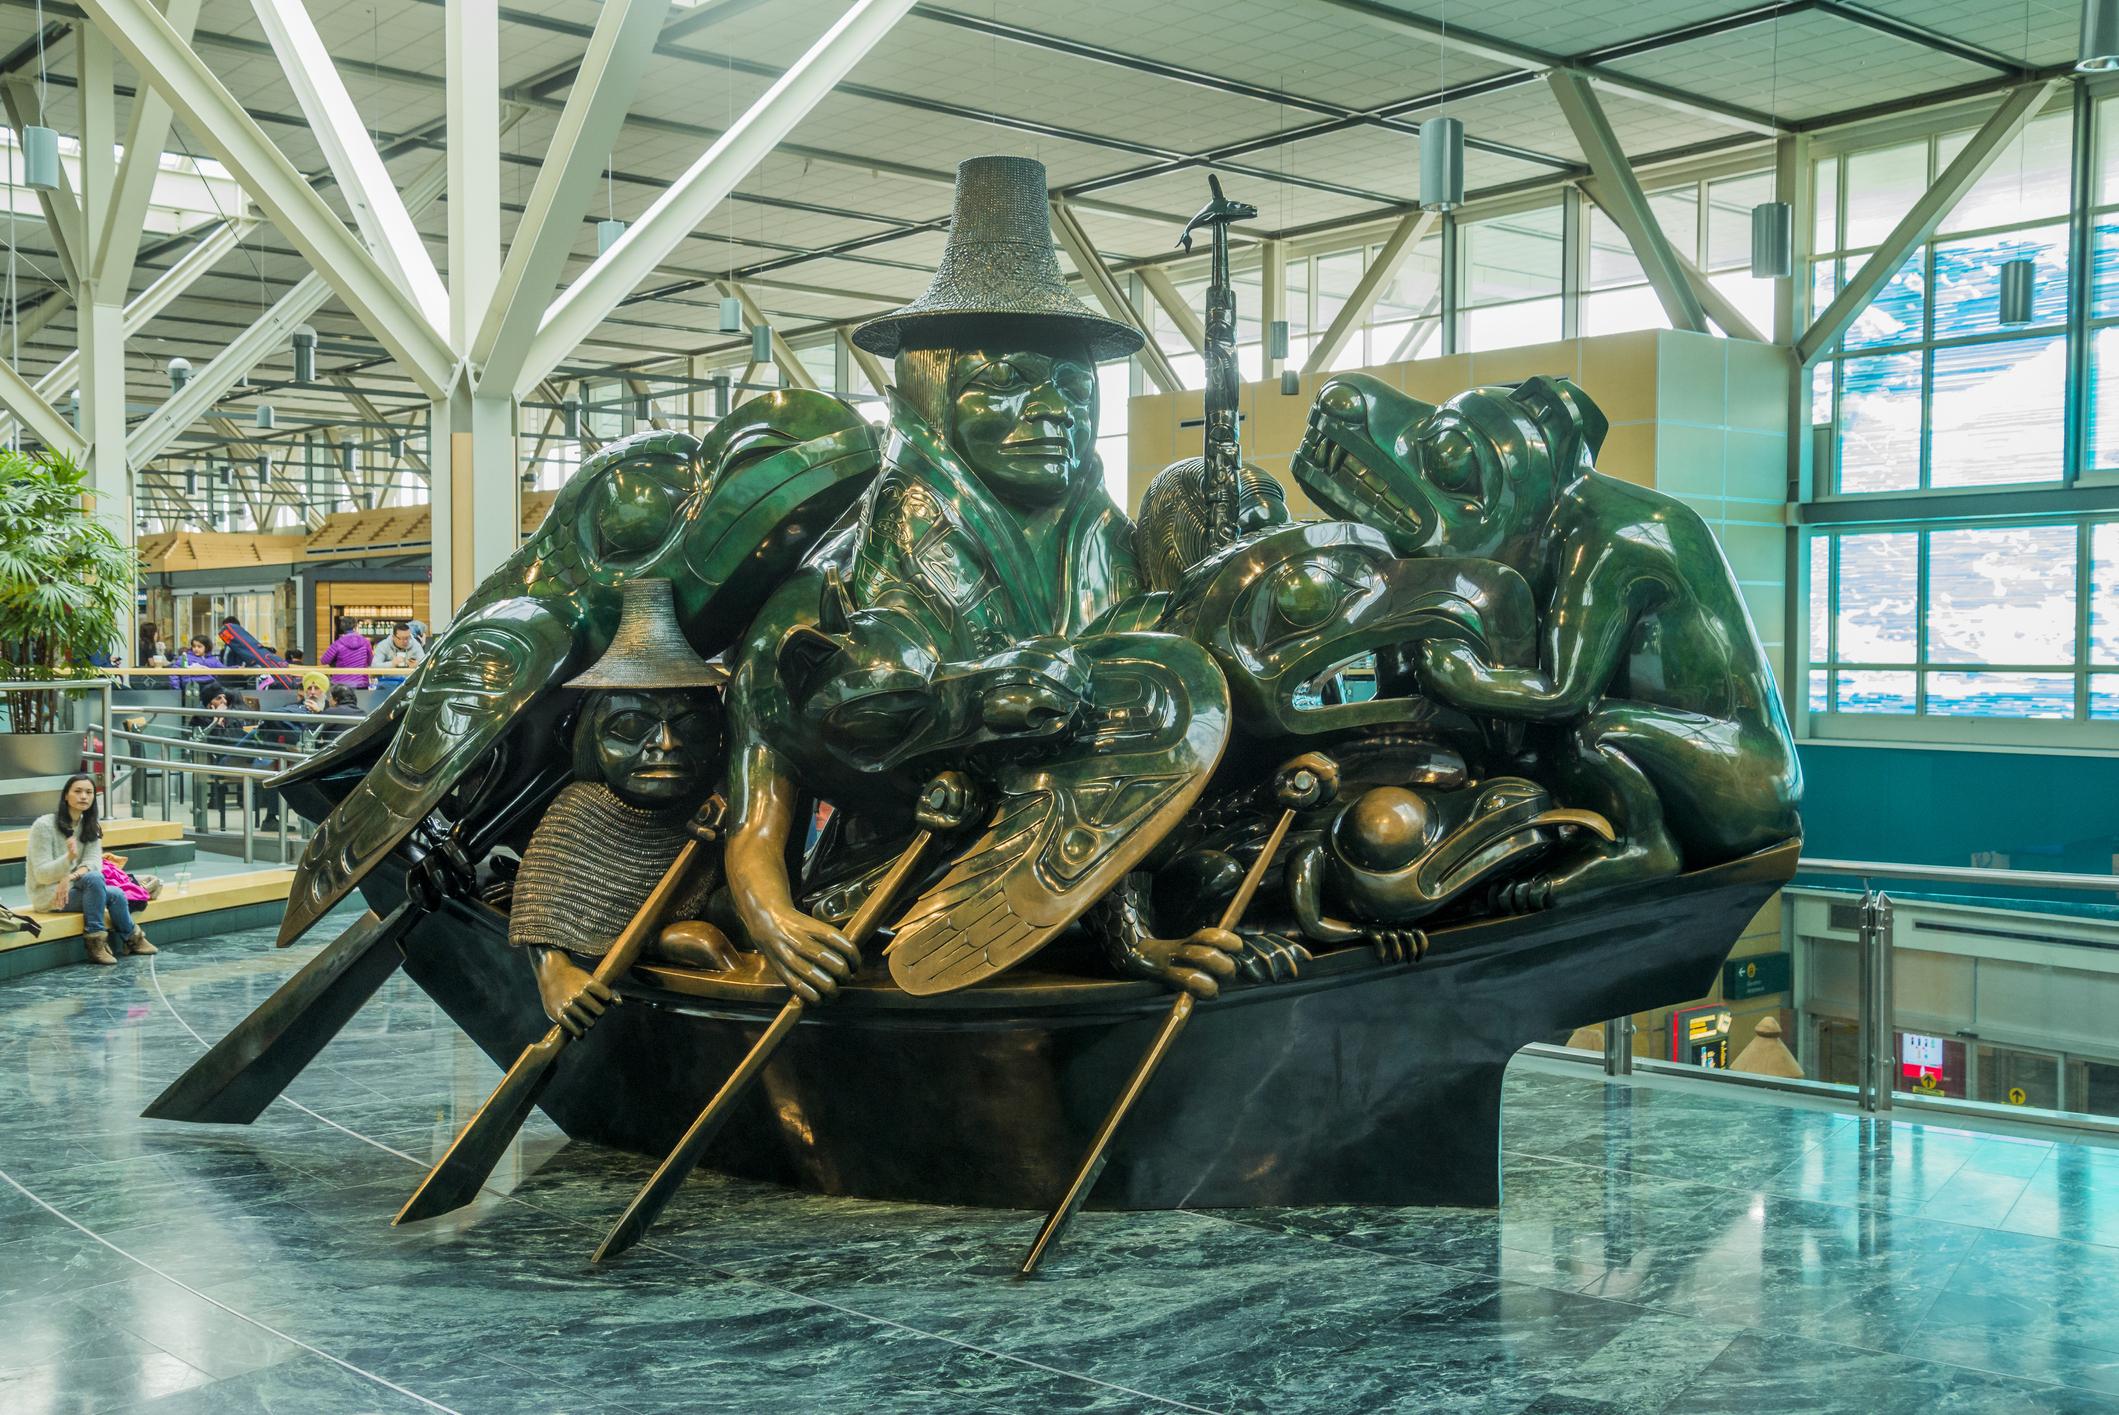 Cast bronze sculpture, The Spirit of Haida Gwaii, the Jade Canoe, by artist Bill Reid in the Vancouver International Airport.